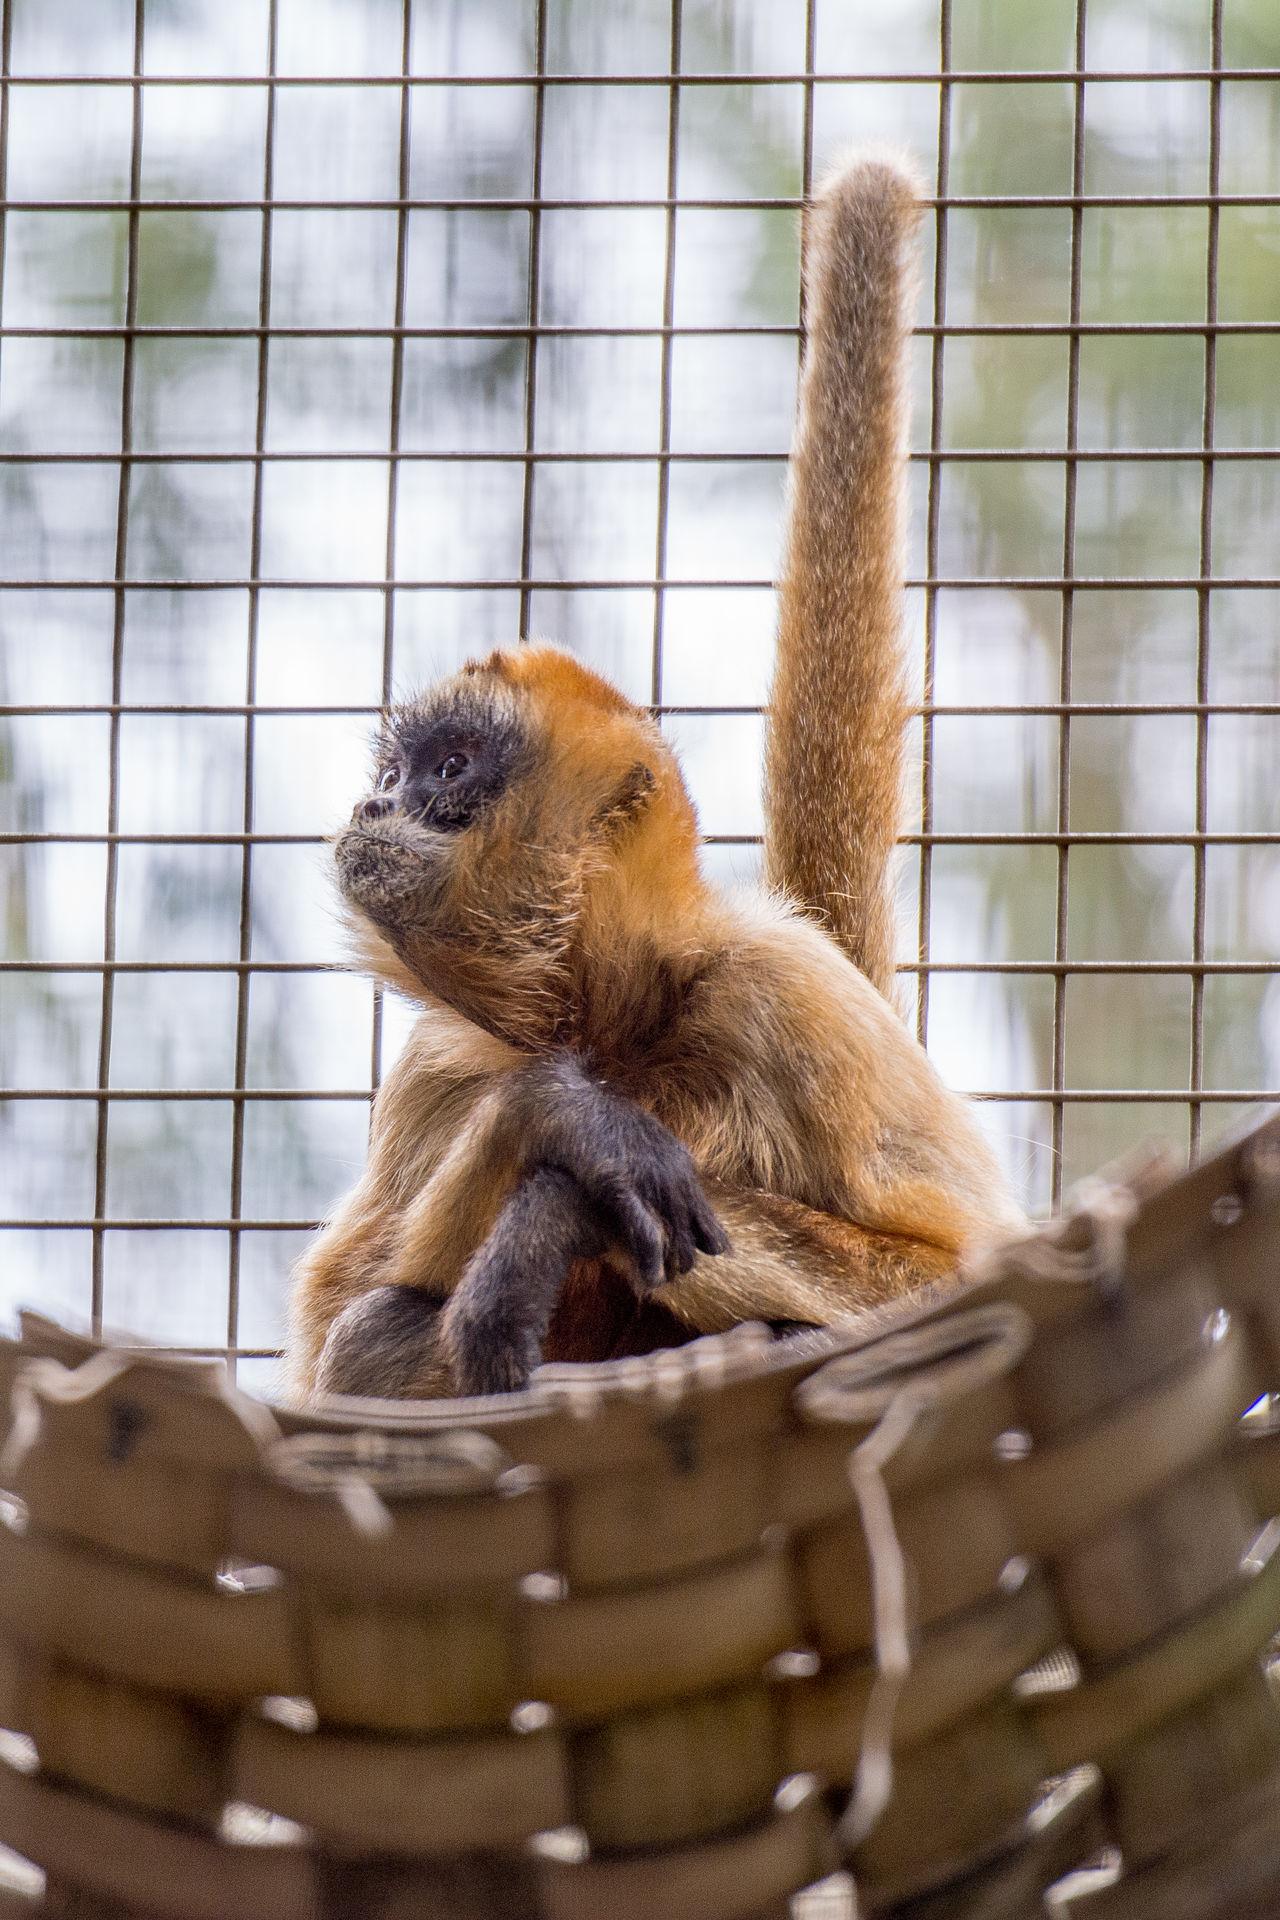 Beautiful stock photos of monkey, Brown - Color, Cute, Hammock, Innocence